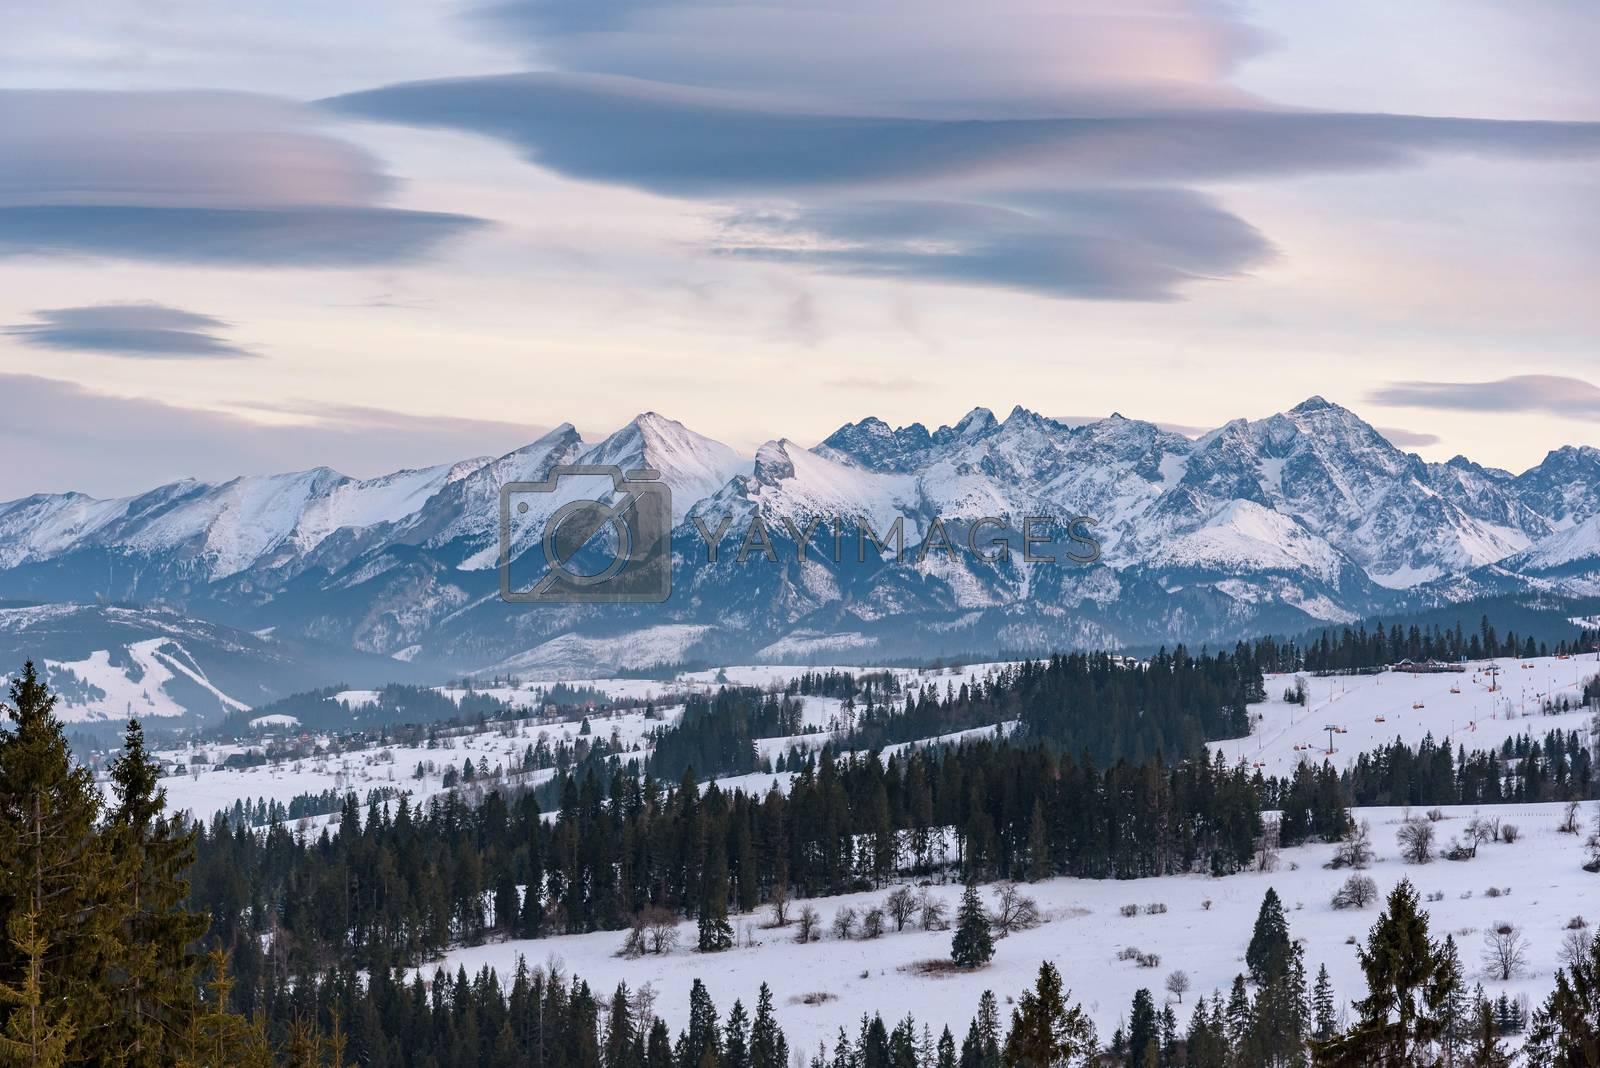 Winter landscape of High Tatra Mountains on the Polish-Slovak border at dusk